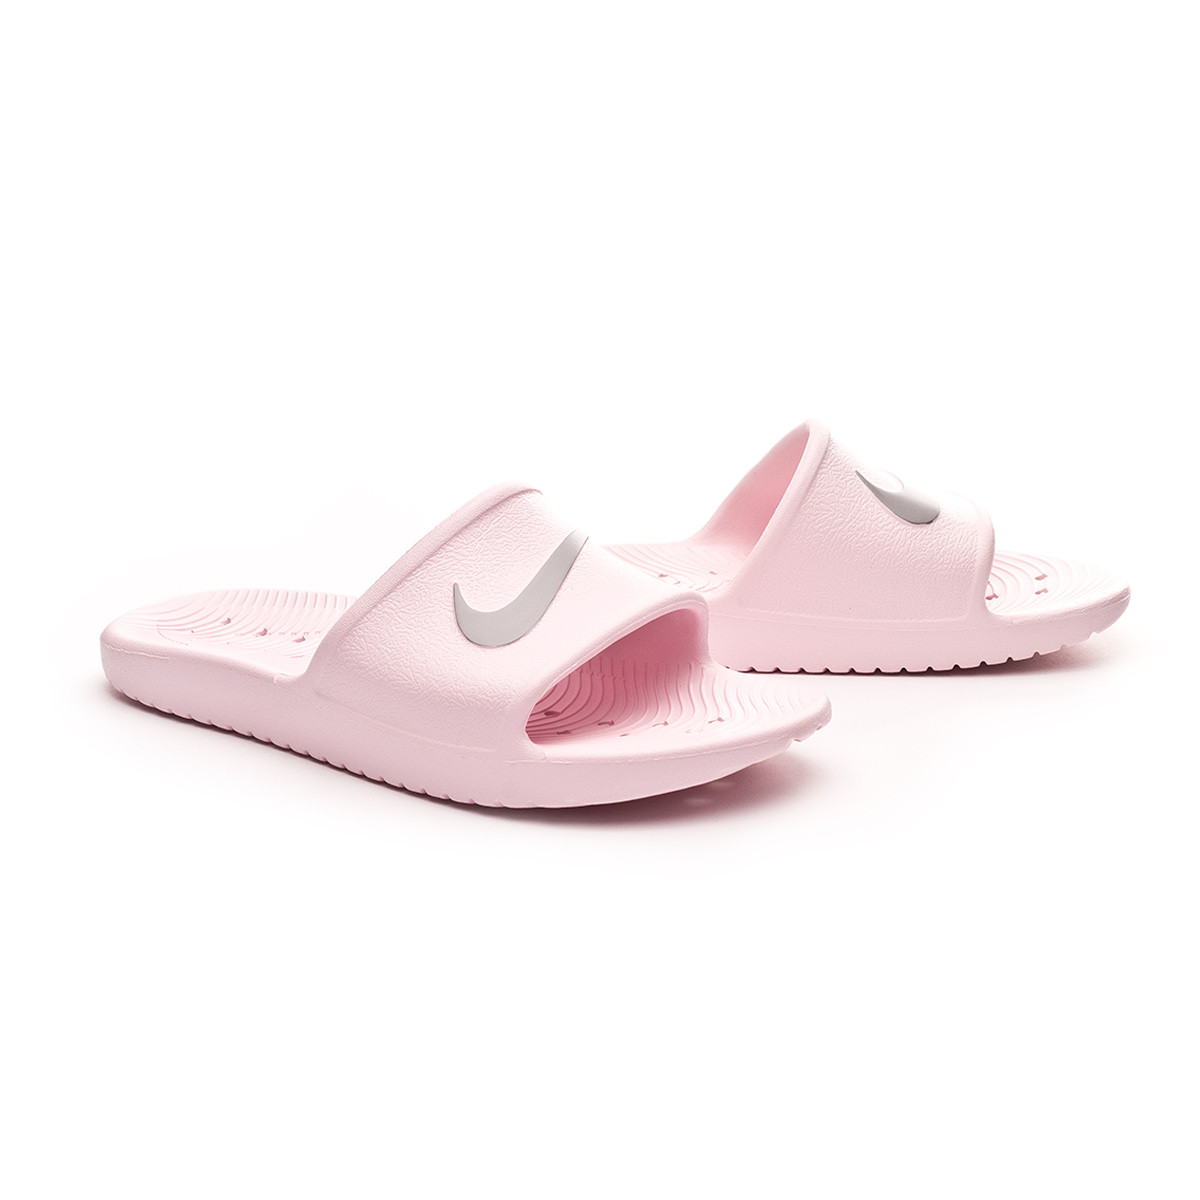 Chanclas Nike Kawa Shower Sandal Mujer